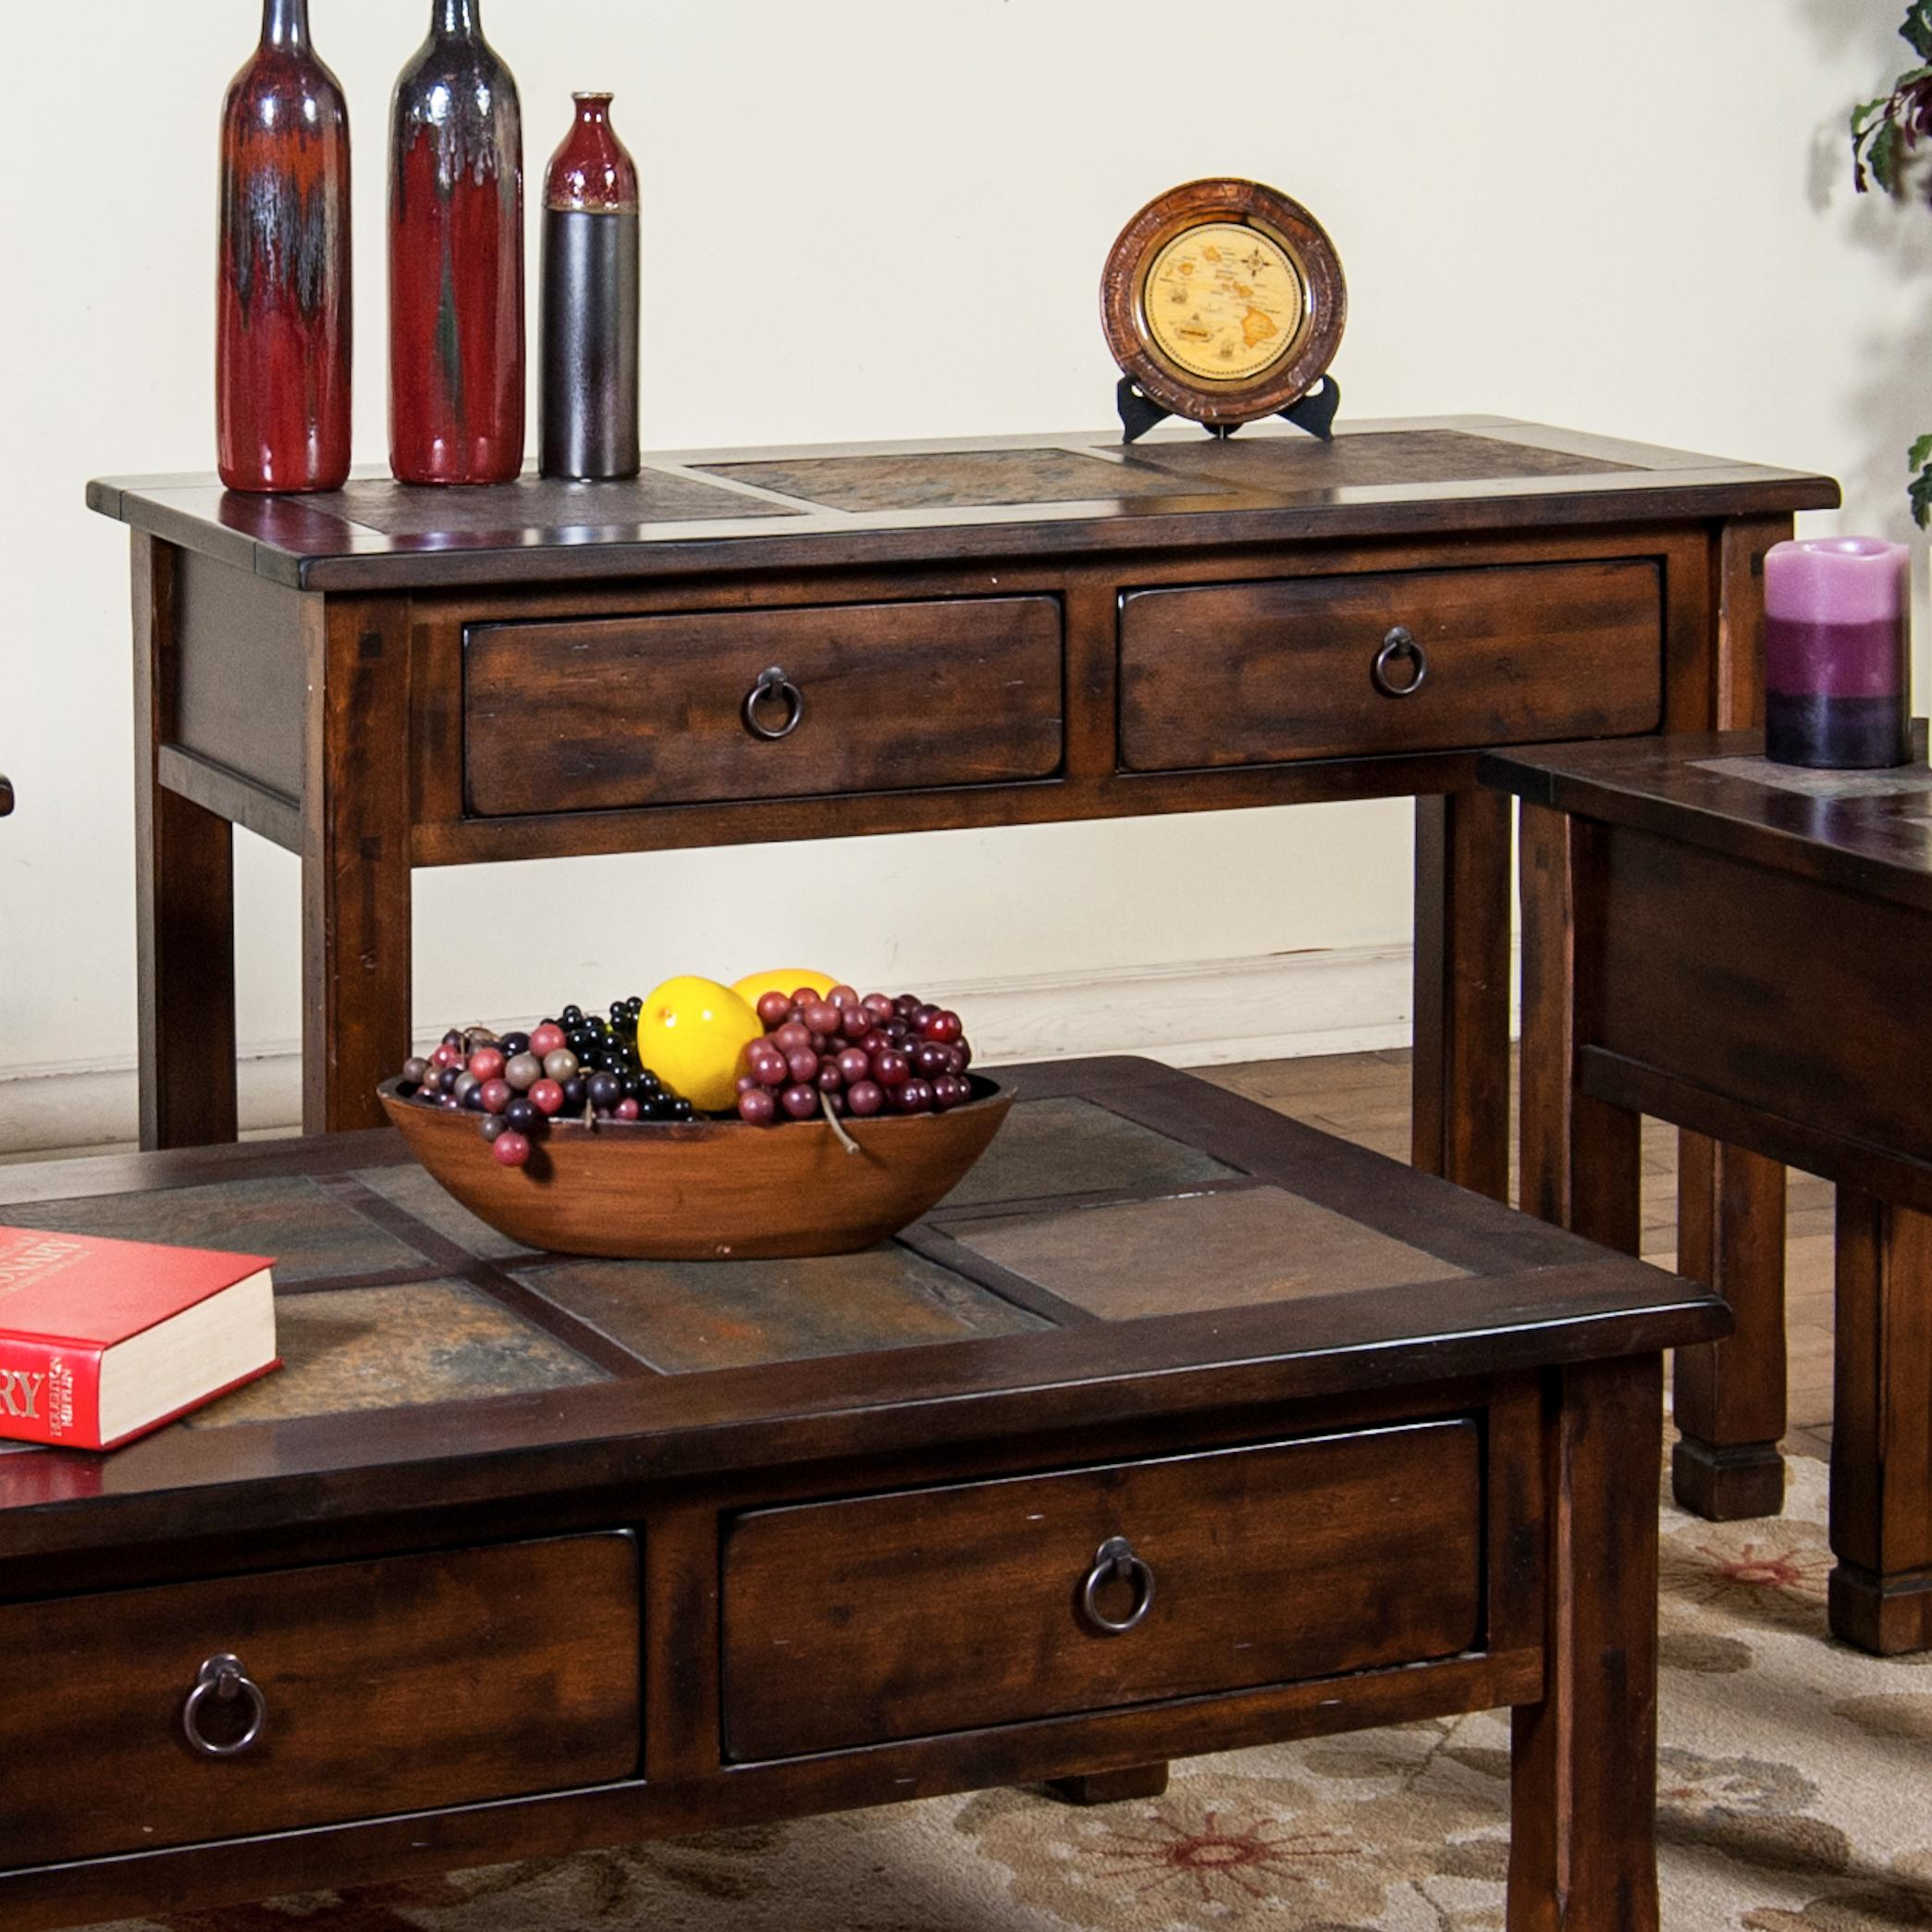 Sunny Designs Santa Fe Sofa/Console Table w/ Slate Top - Item Number: 3145DC